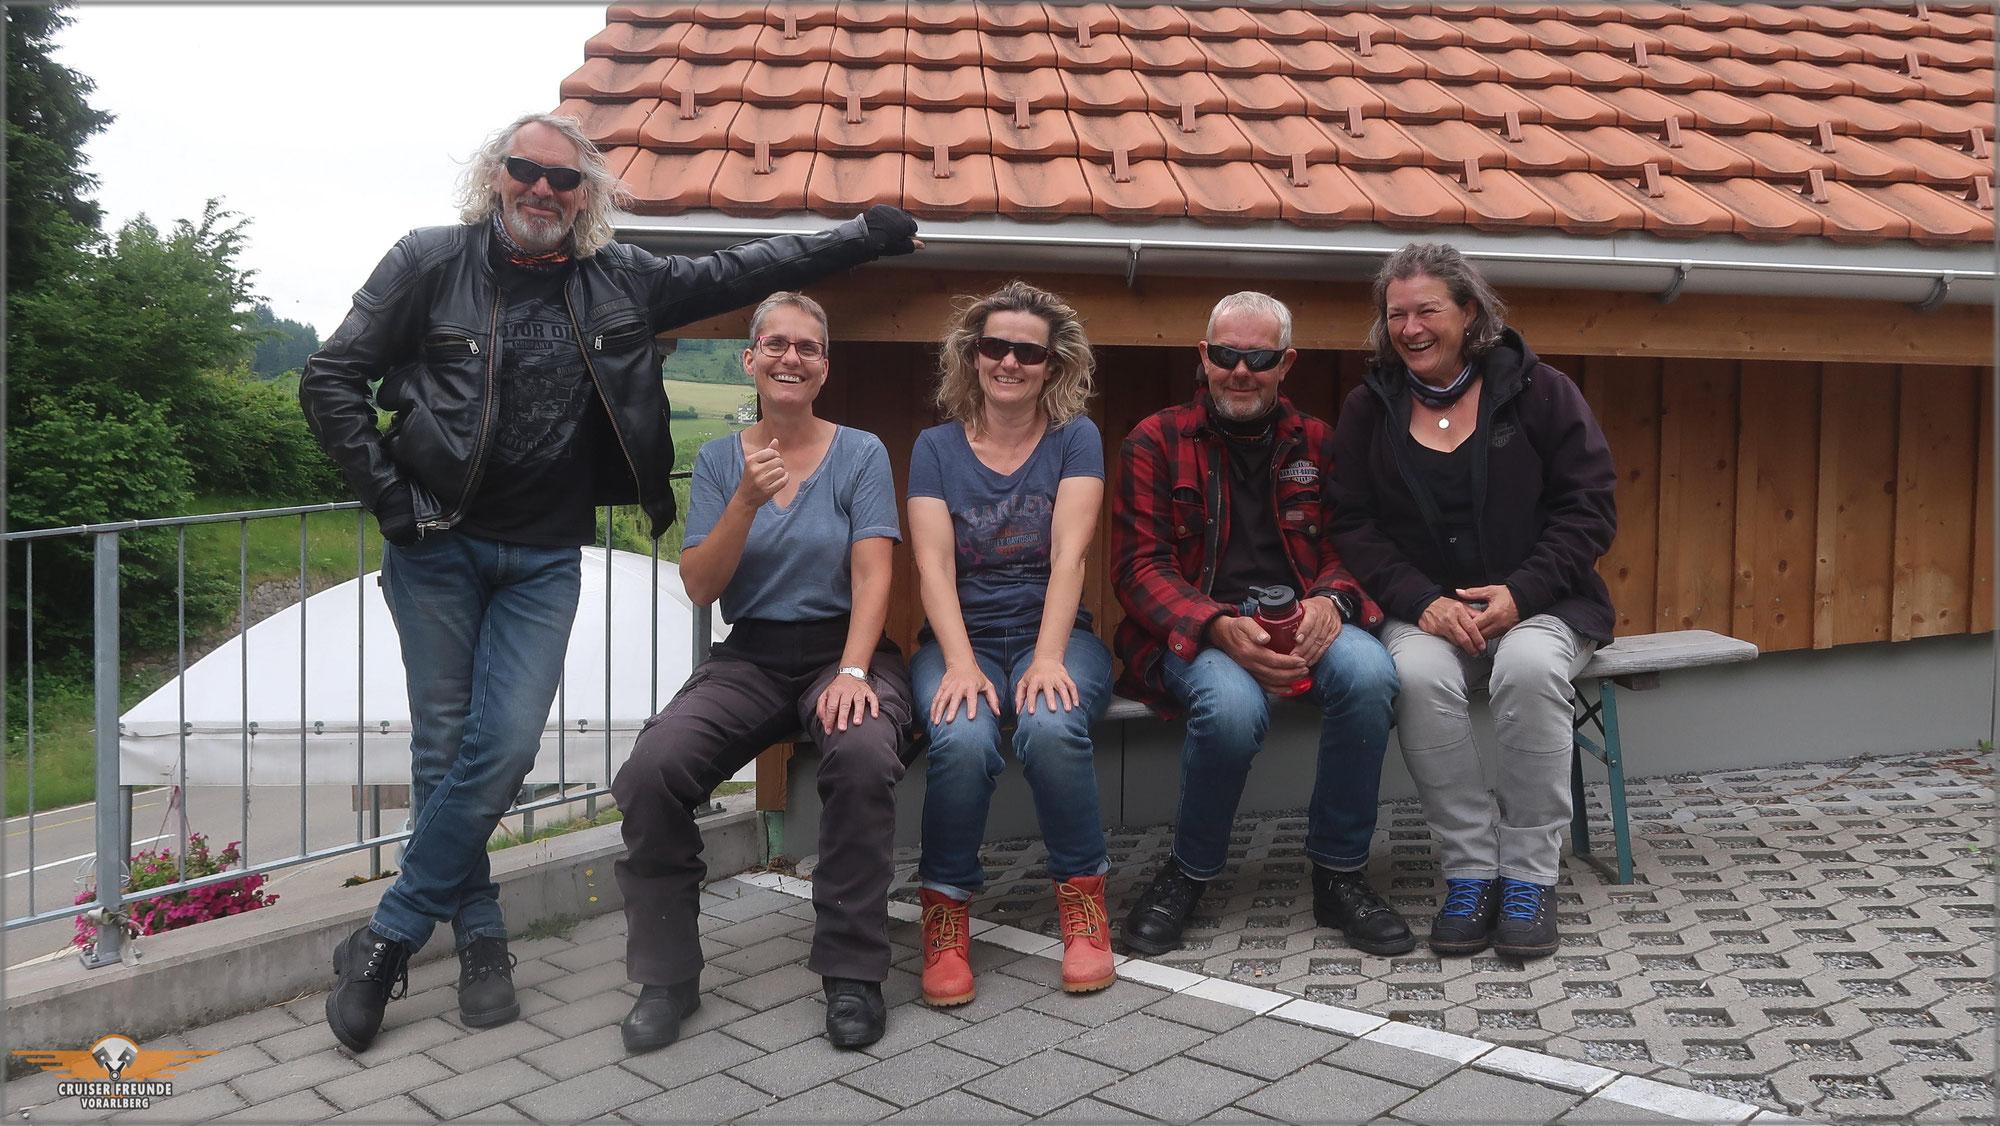 Tour Appenzell